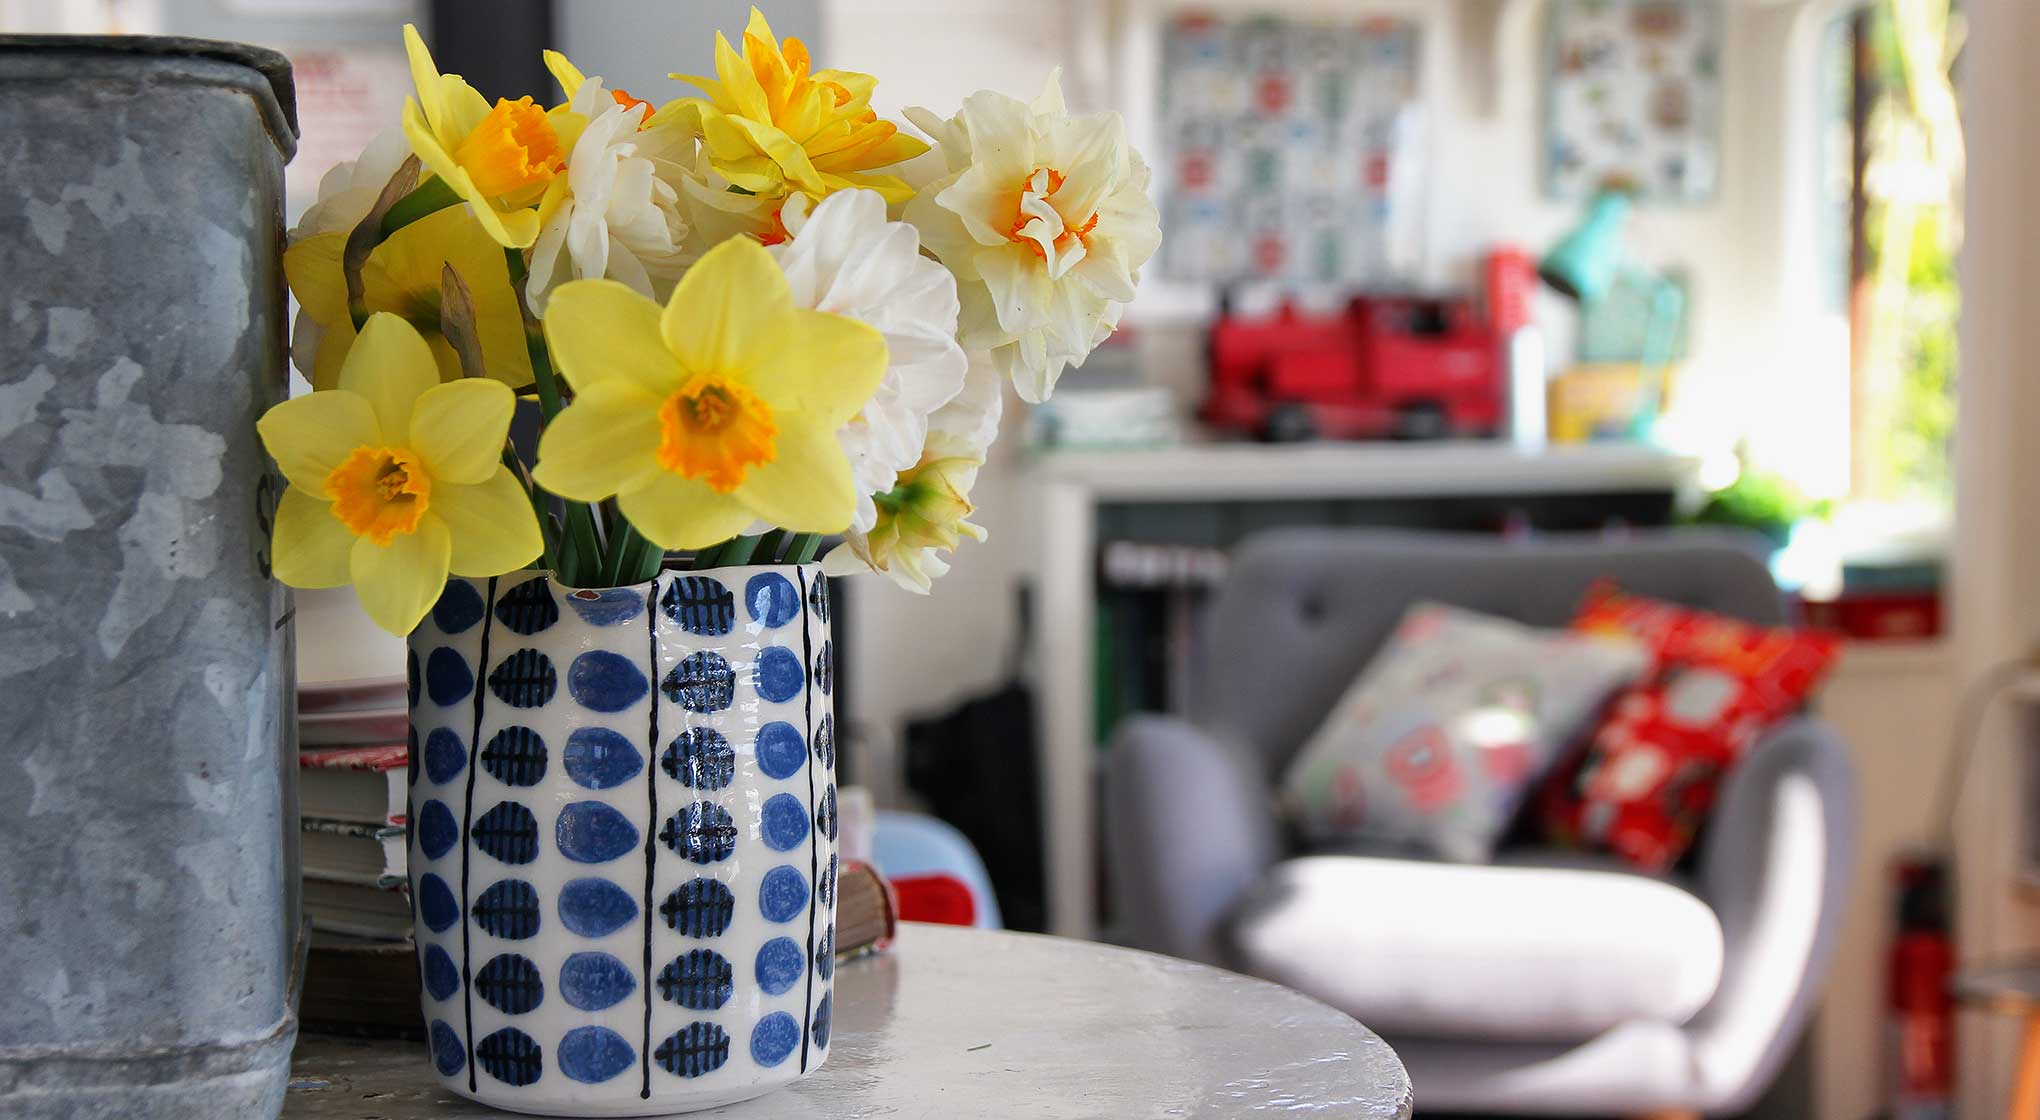 Interior-Daffodils with train.jpg